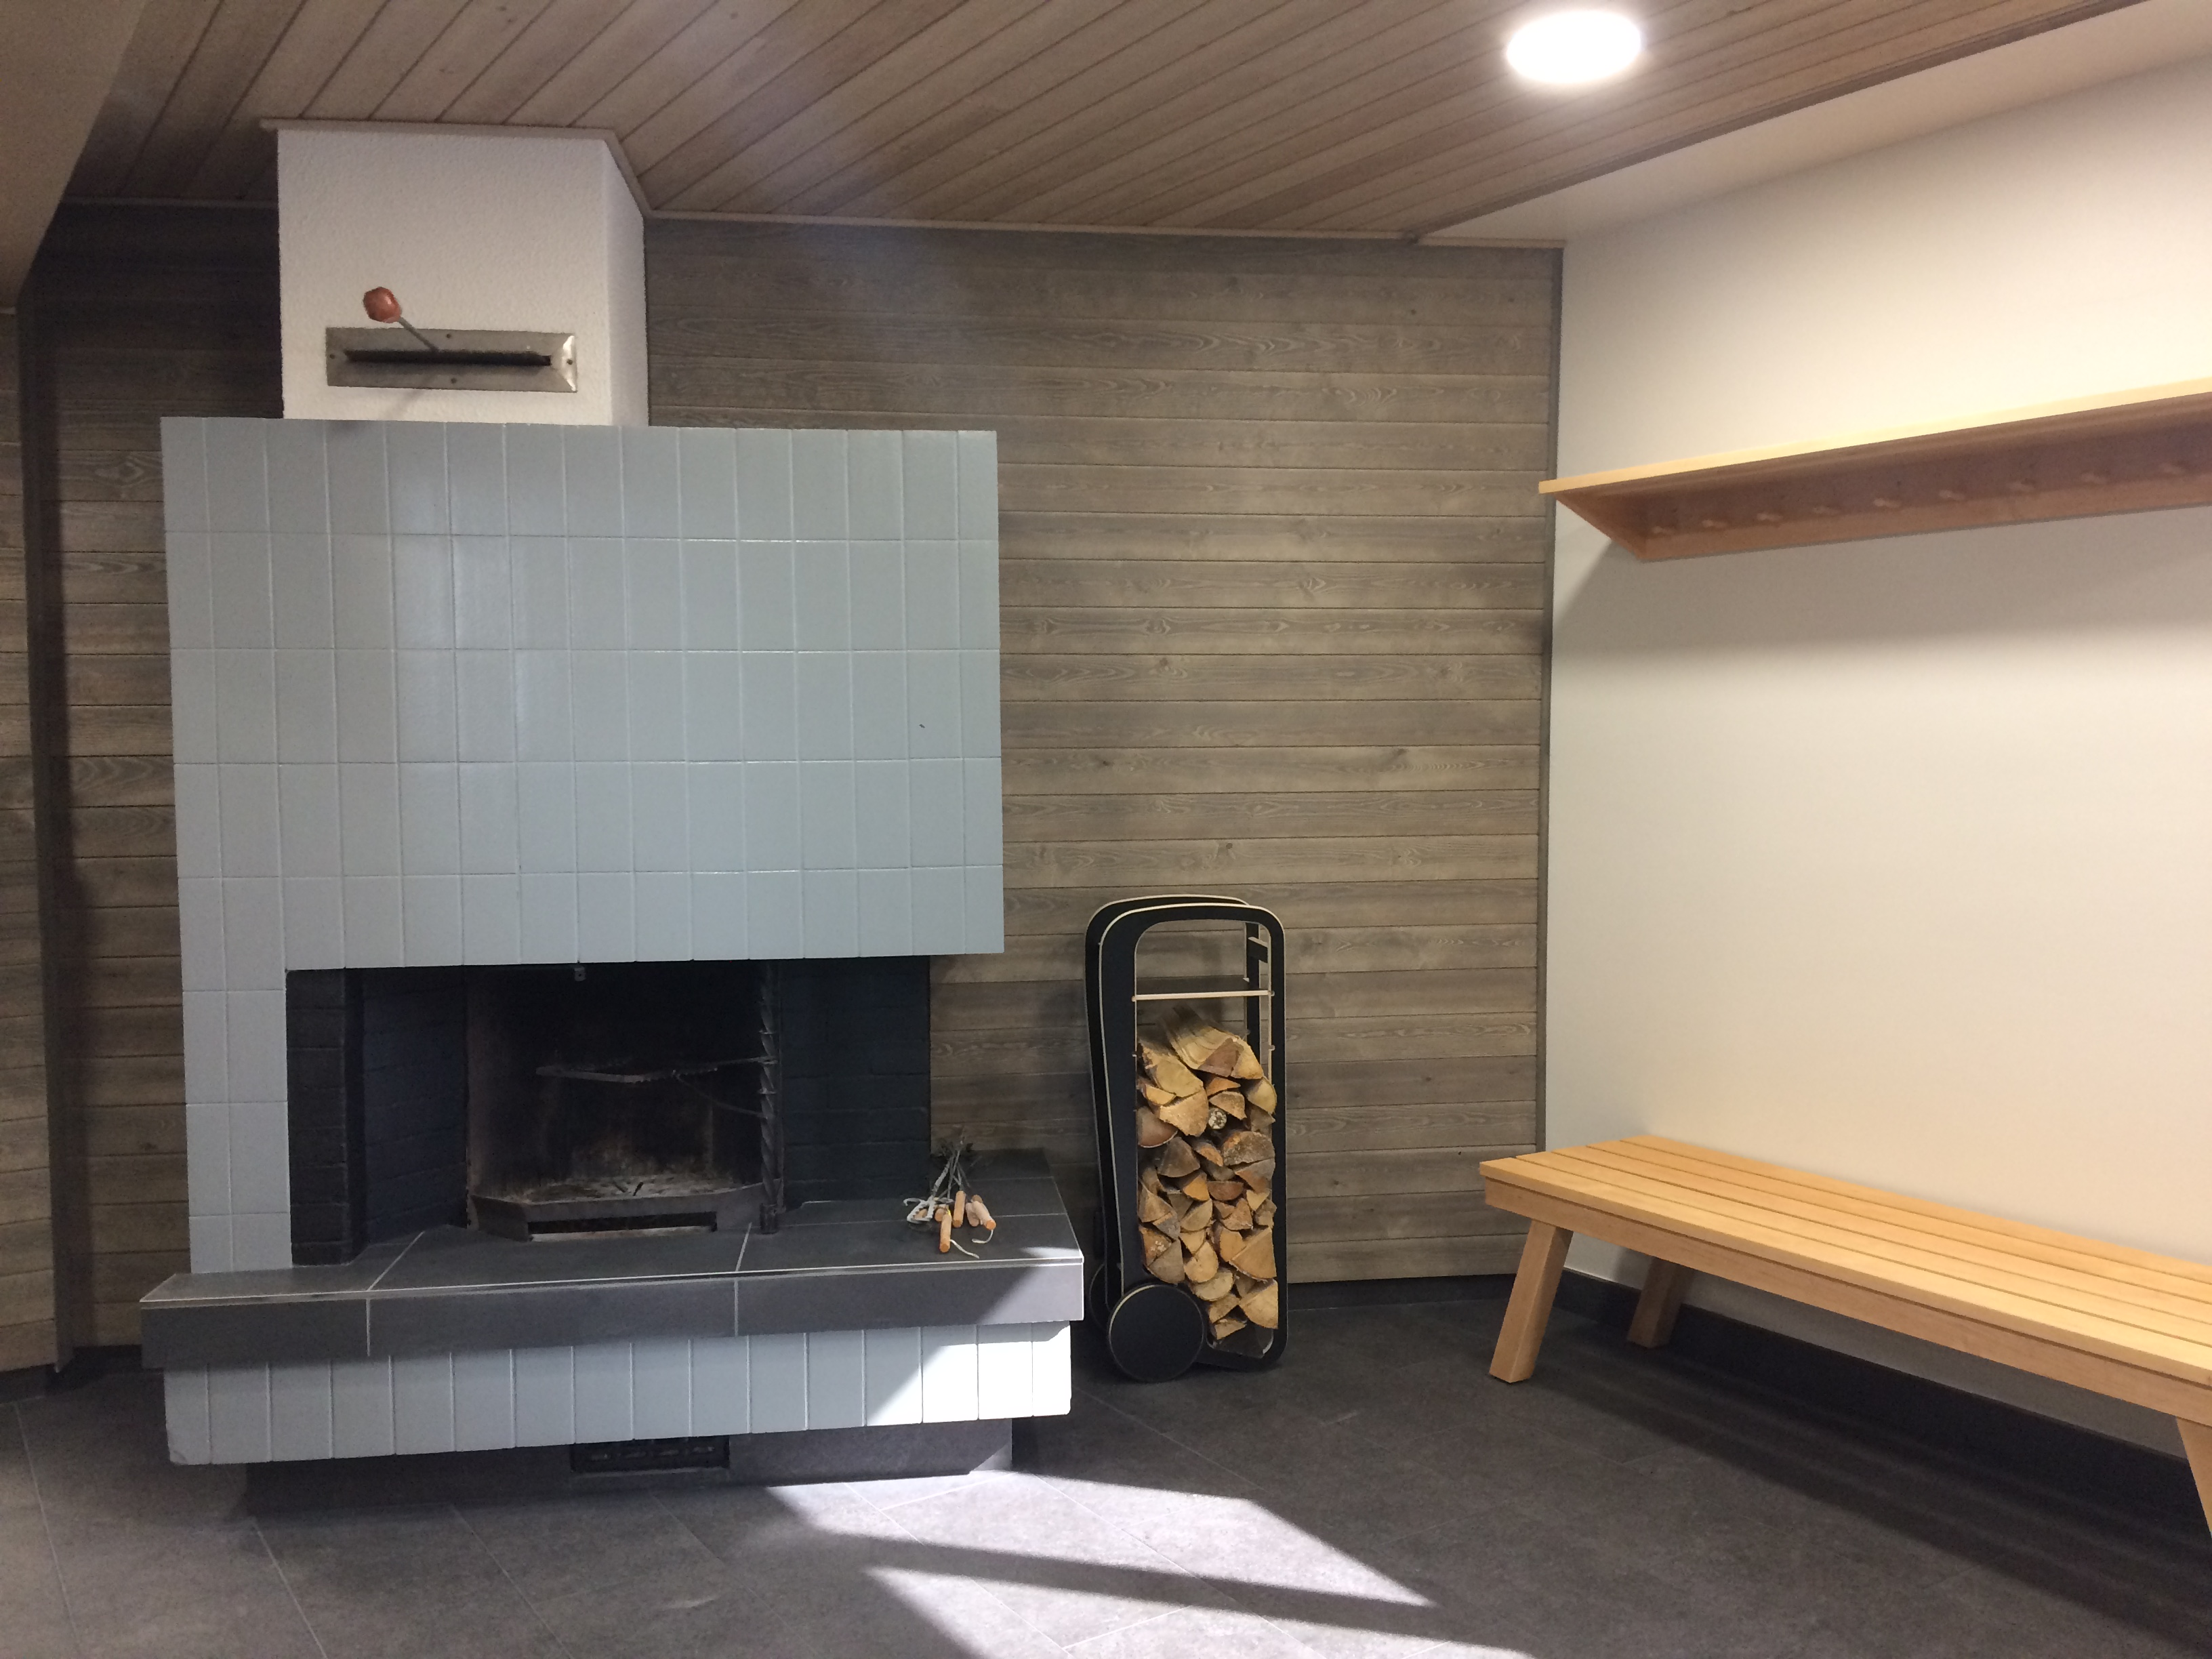 fleimio trolley original (black) in new Pajulahti sauna's fireplace room #3